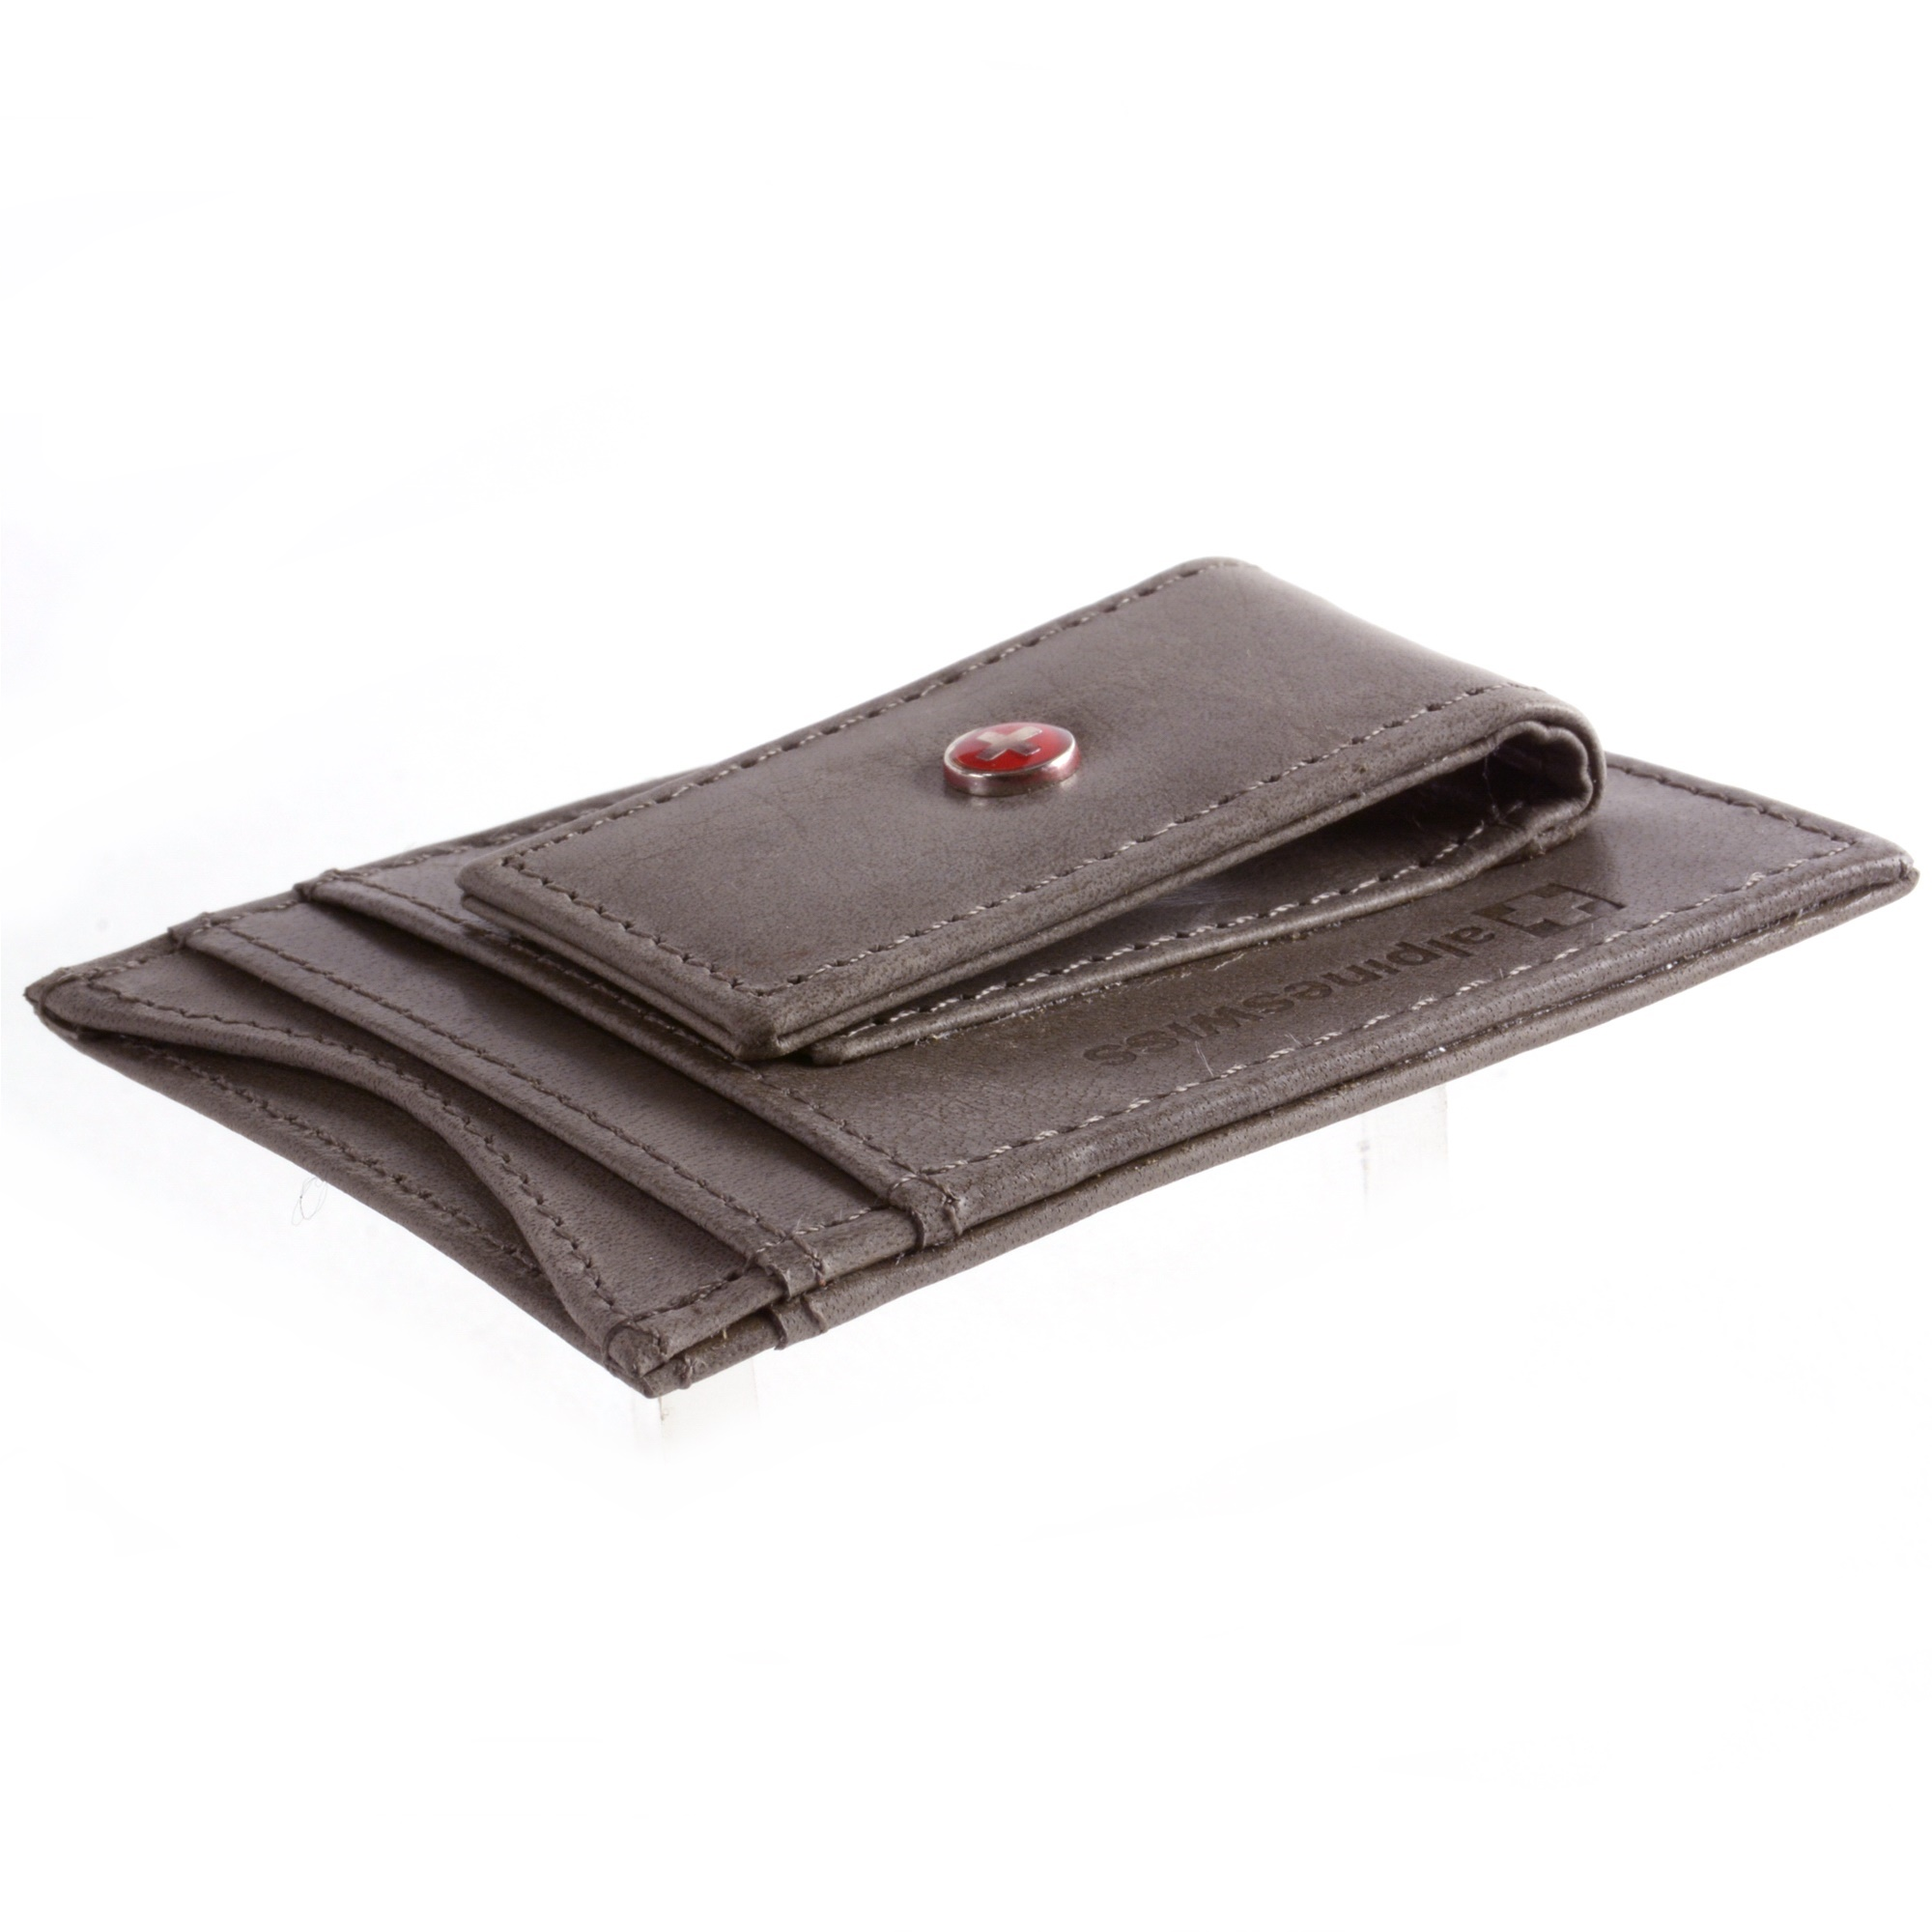 Alpine Swiss Mens Wallet Leather Money Clip Thin Slim Front Pocket Wallet Gray